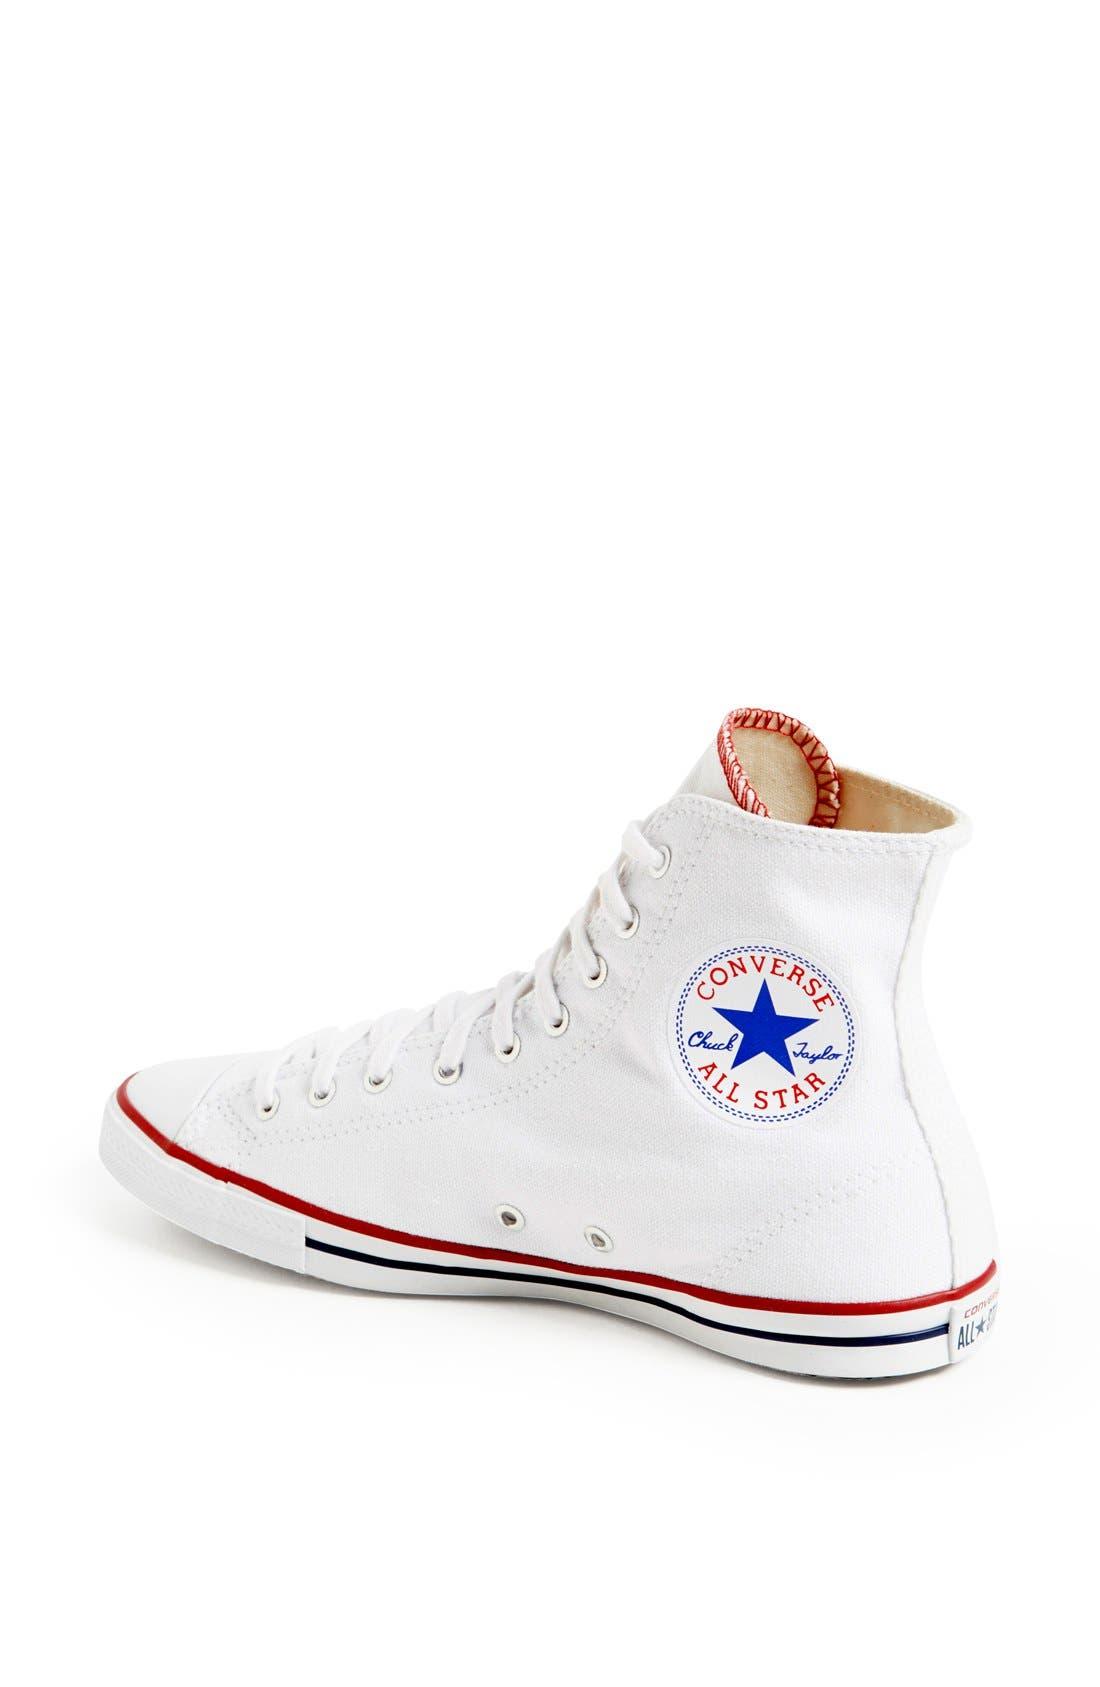 Alternate Image 3  - Converse Chuck Taylor® All Star® 'Fancy' High Top Sneaker